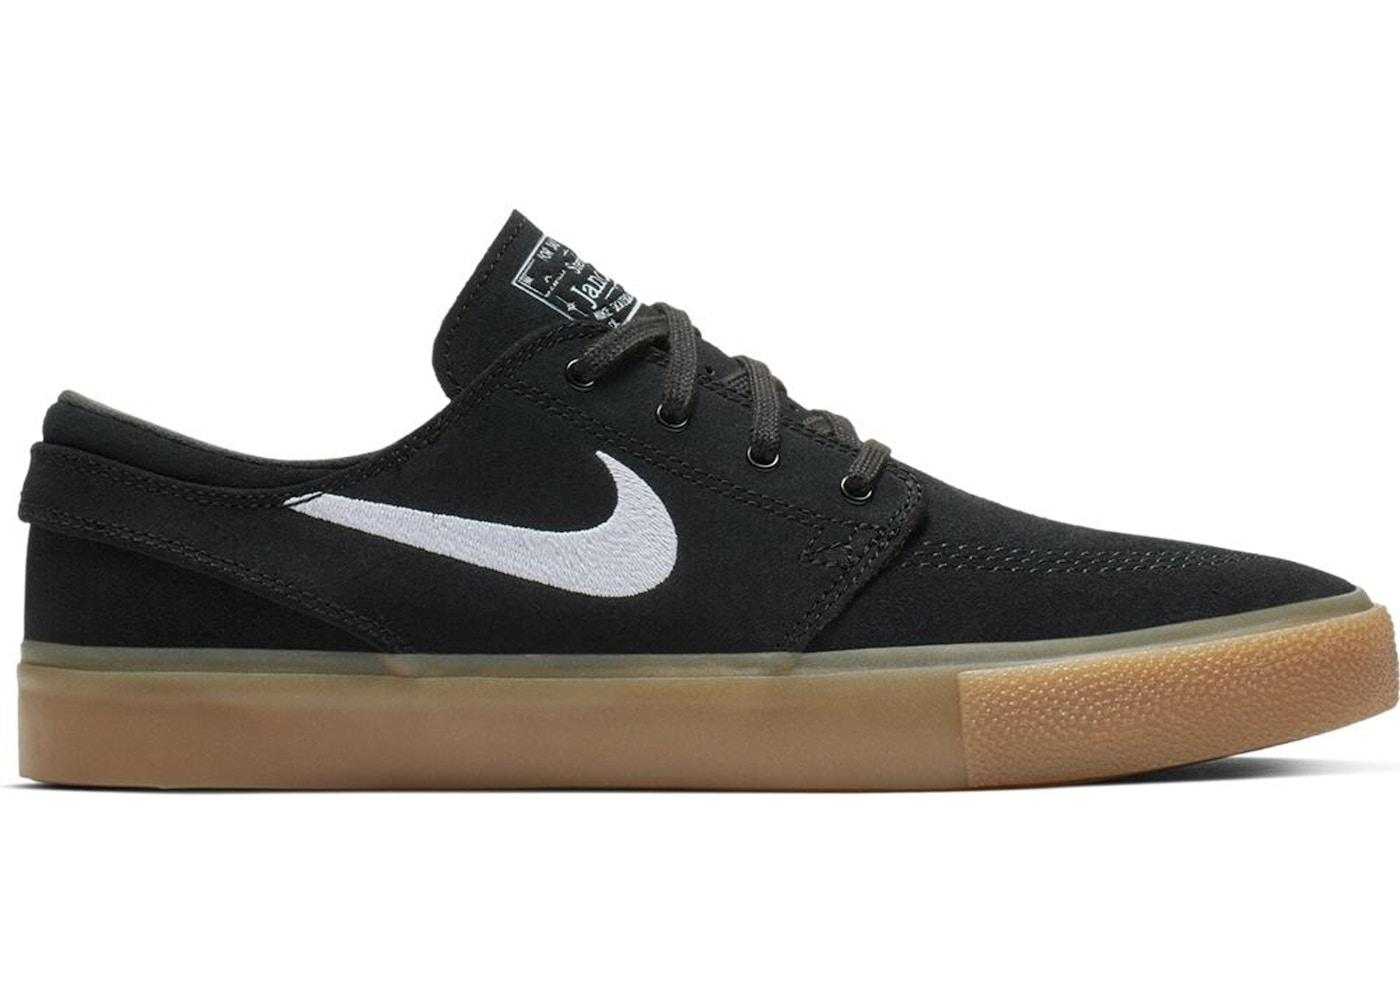 Nike Sb Zoom Janoski Rm Black White Gum Aq7475 003